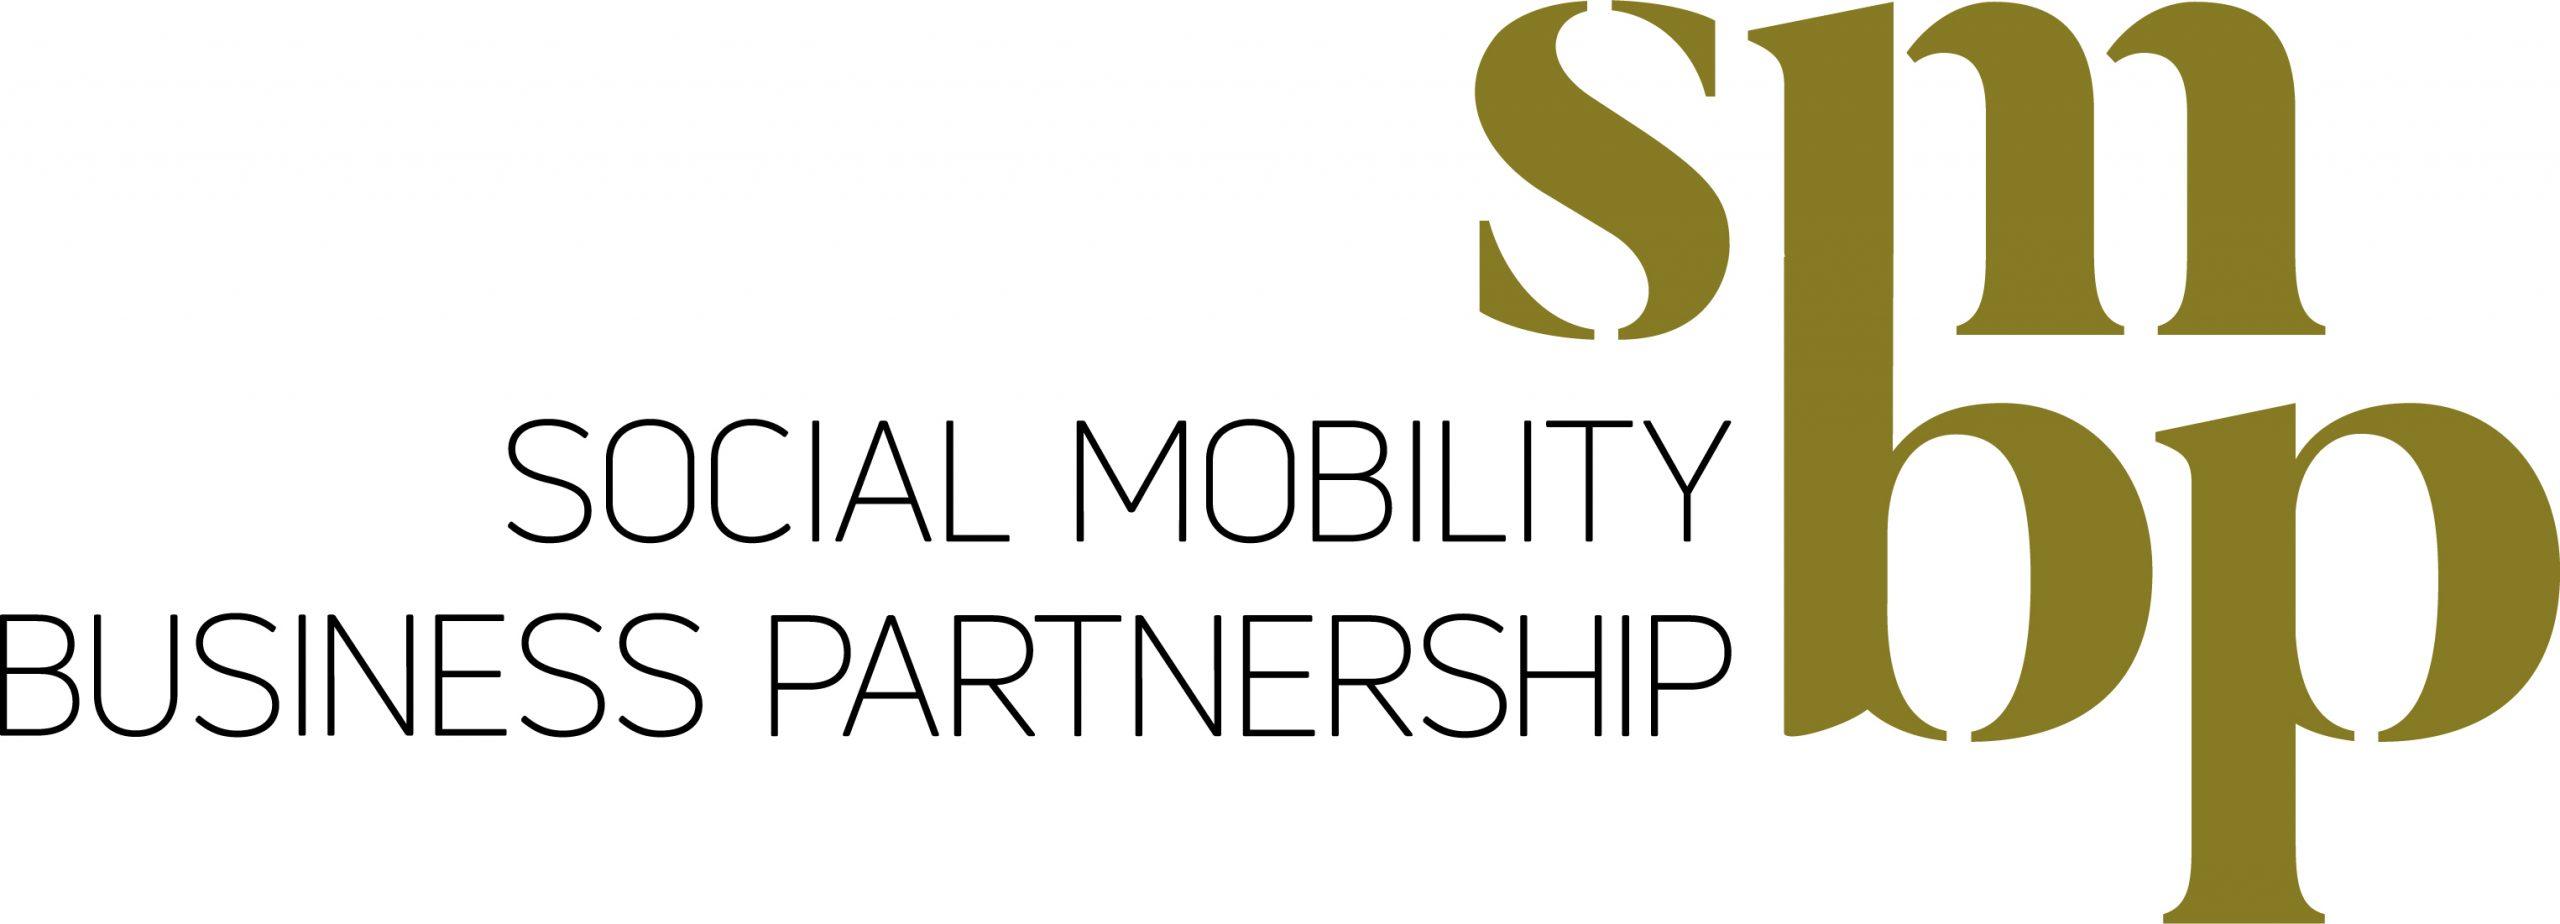 Social Mobility Business Partnership